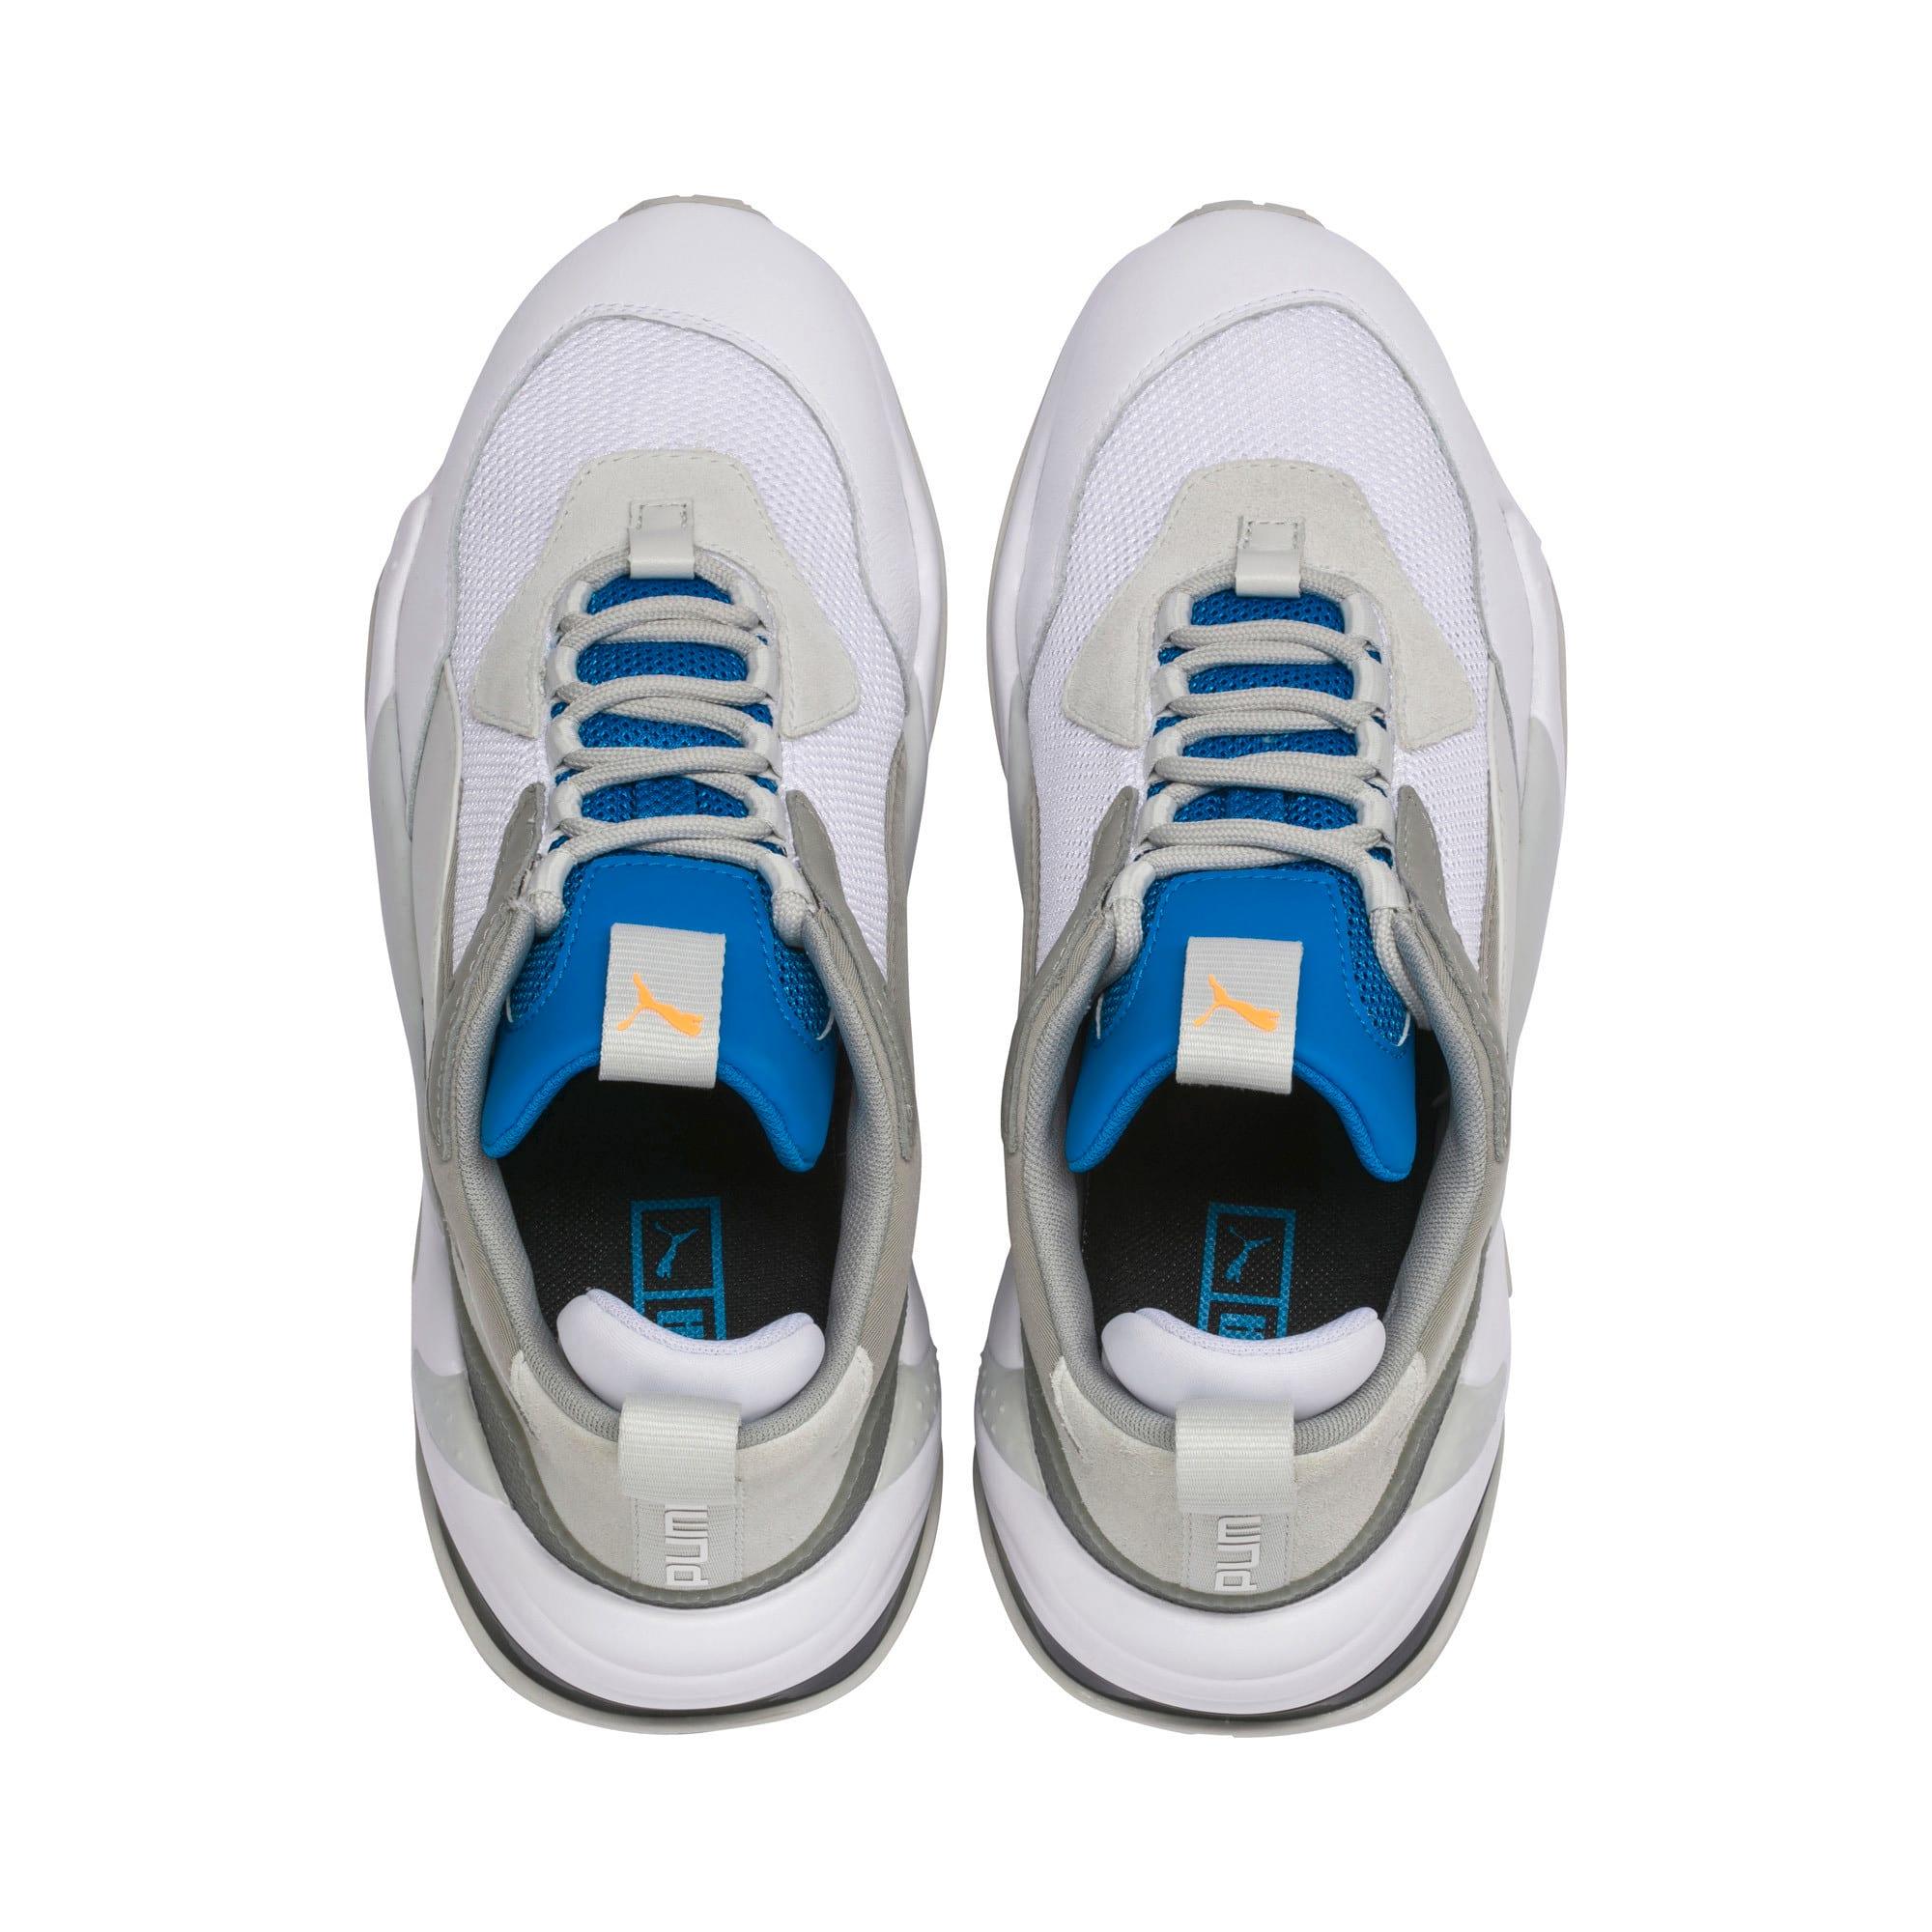 Thumbnail 6 of Sneakers Thunder Spectra, Glacier Gray-Indigo Bunting, medium